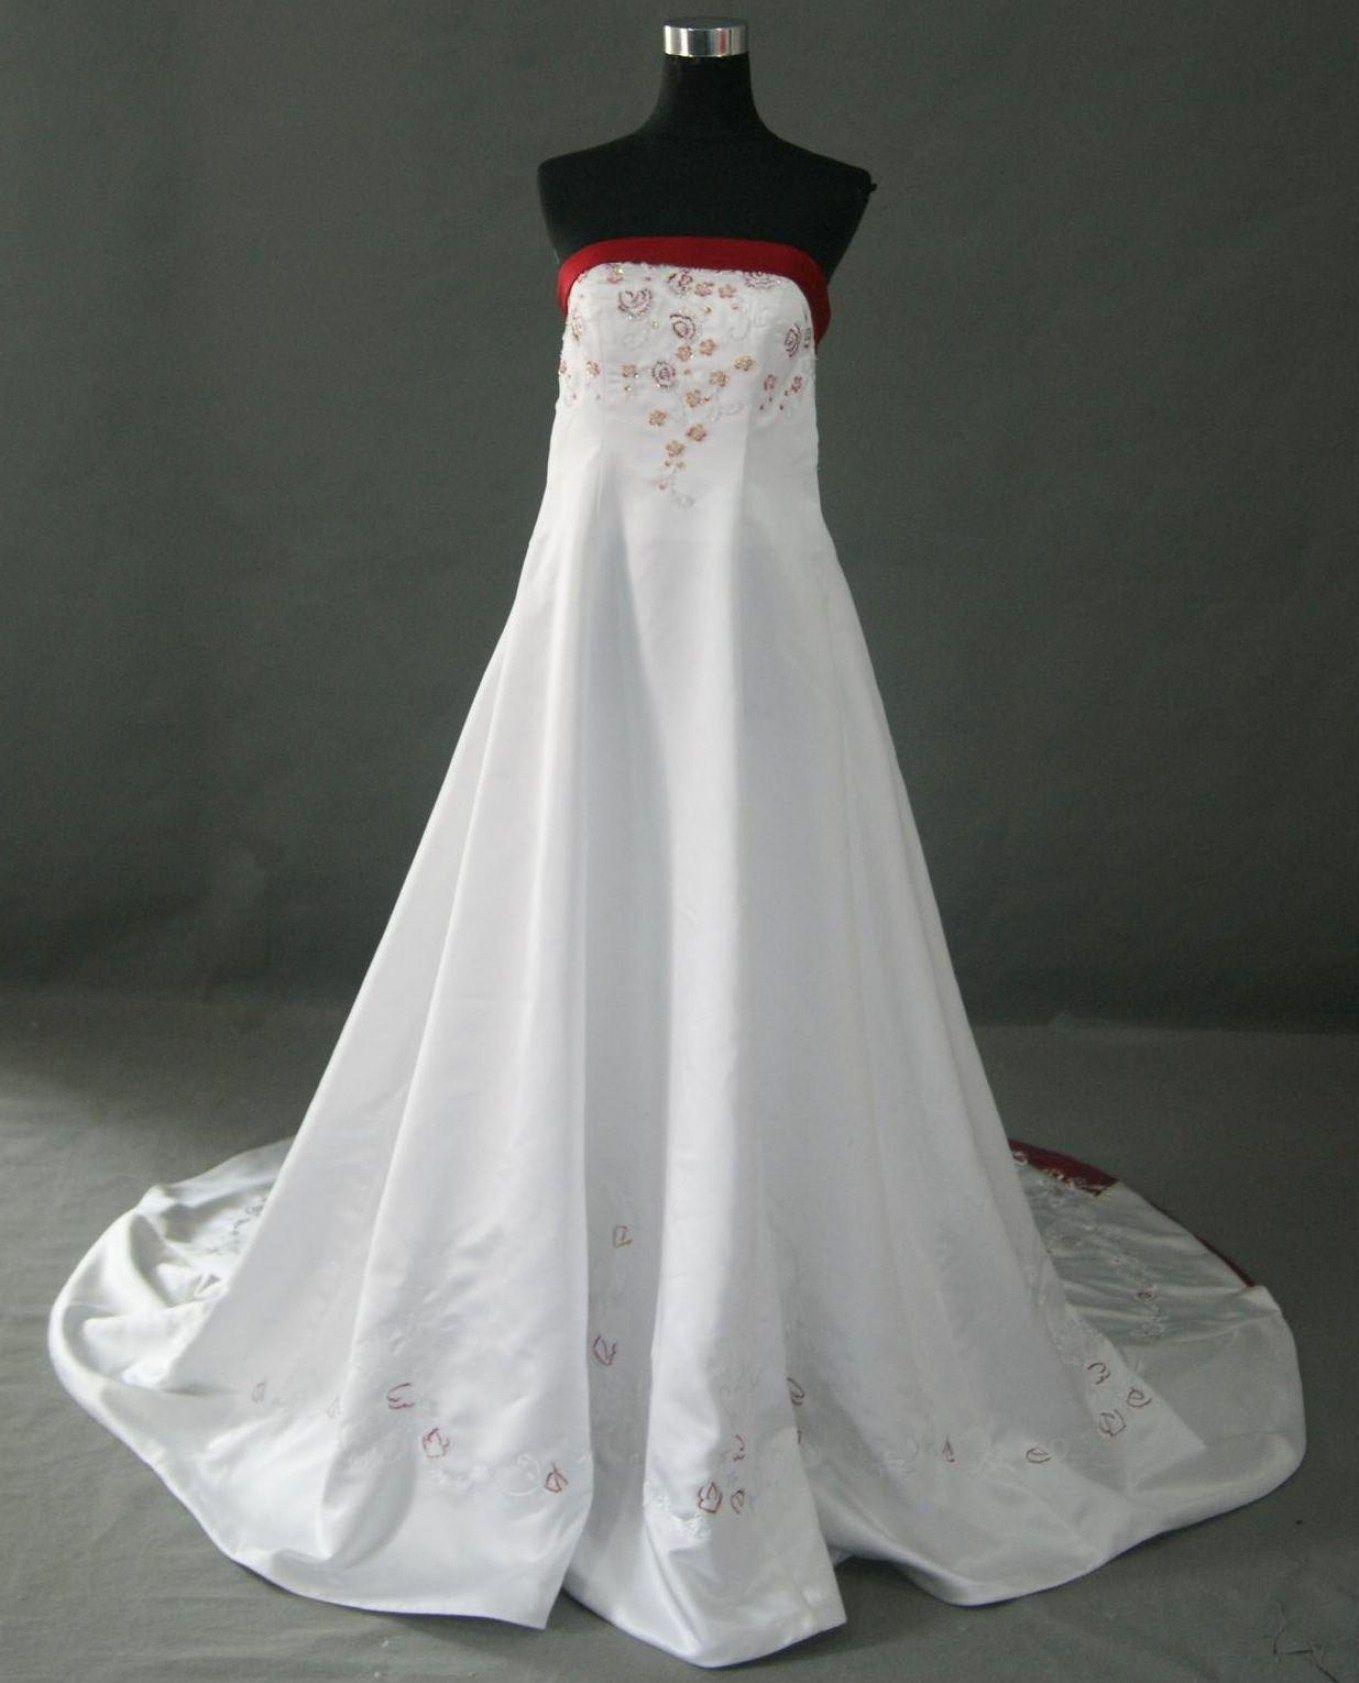 30 Beautiful White Wedding Dress With Black Flowers Black Flowers